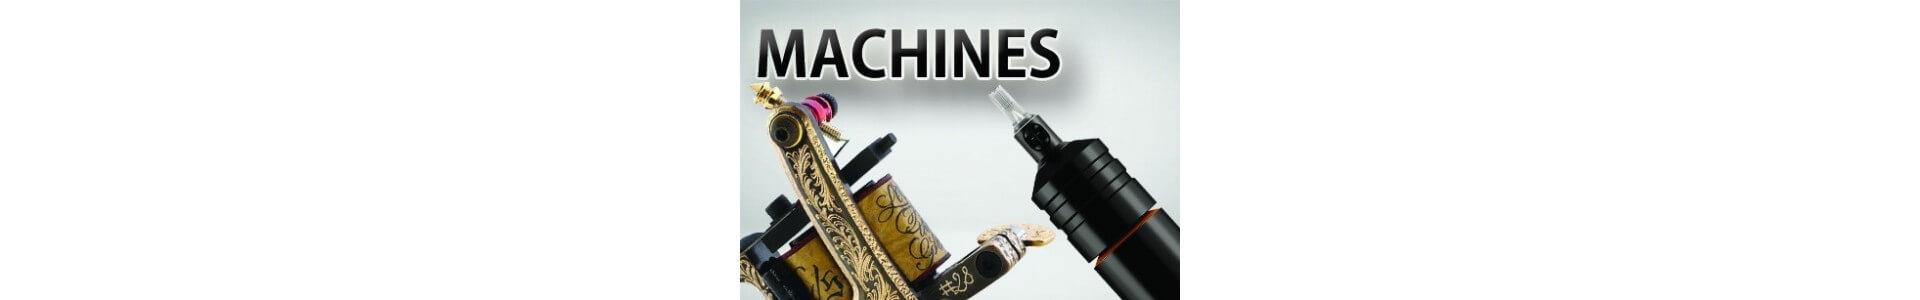 Macchinetta Tatuaggi e Ricambi - Macchinetta Tattoo | Tattoo Supplies